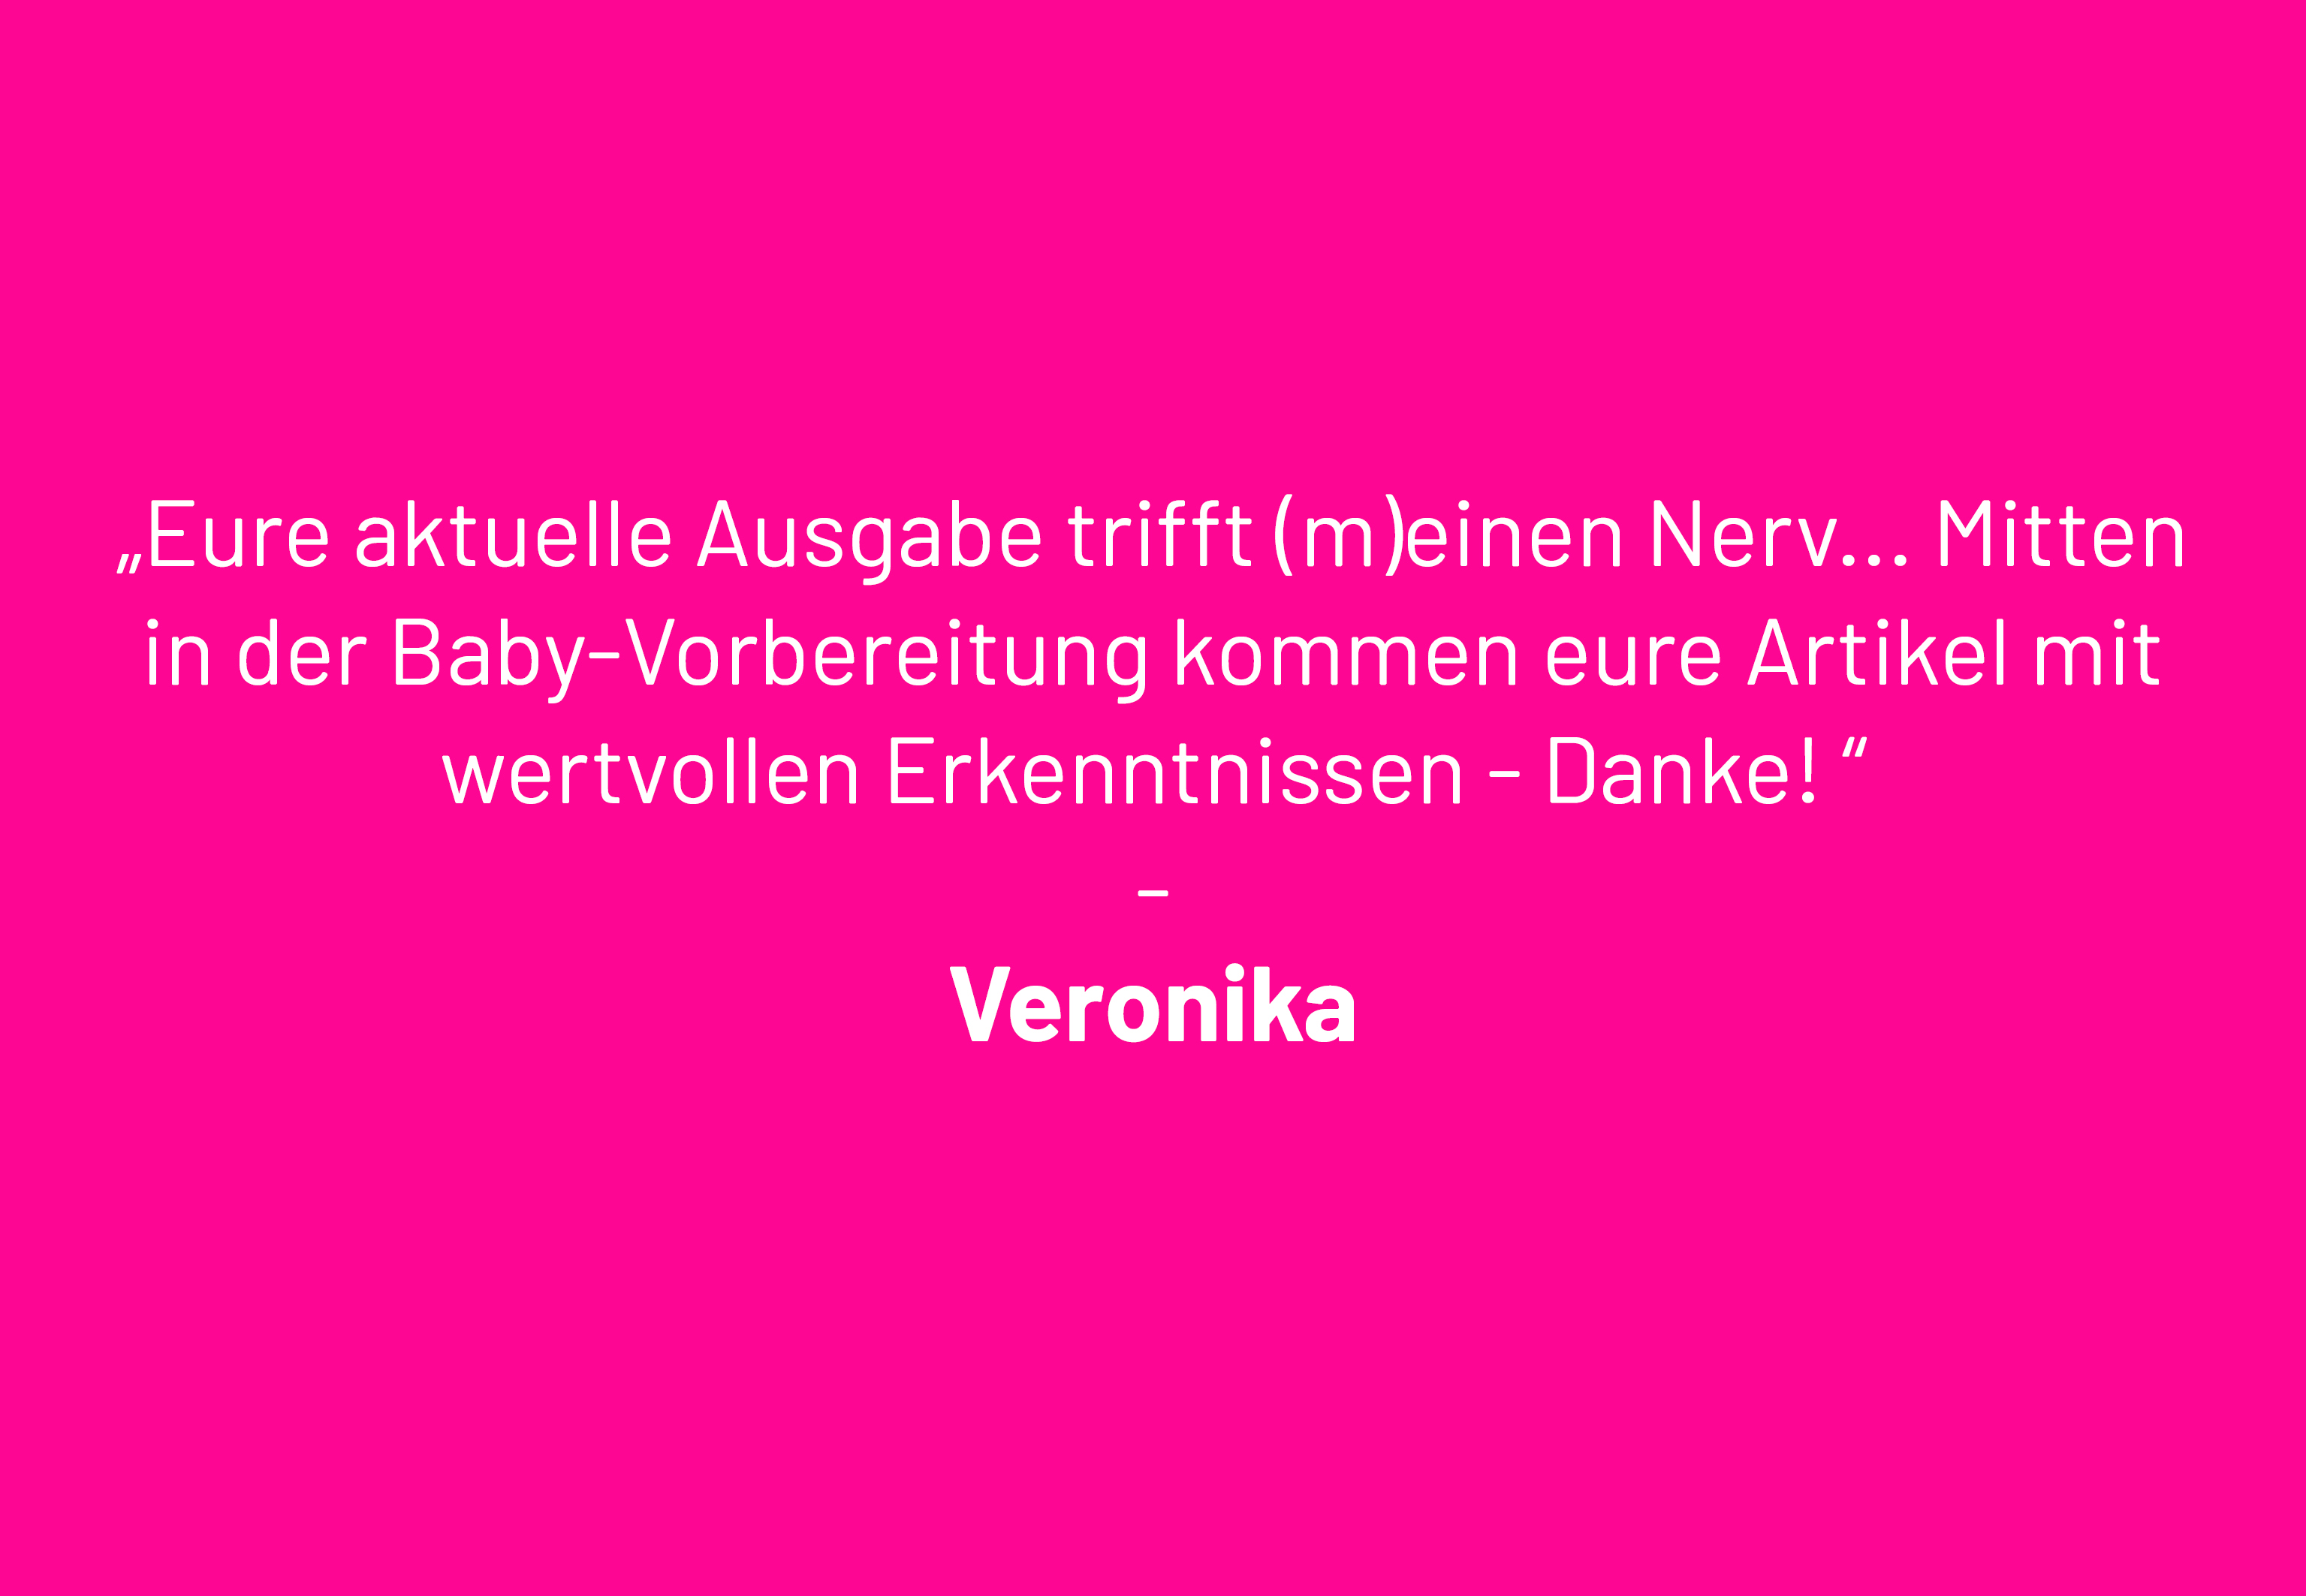 Veronika Leserbrief